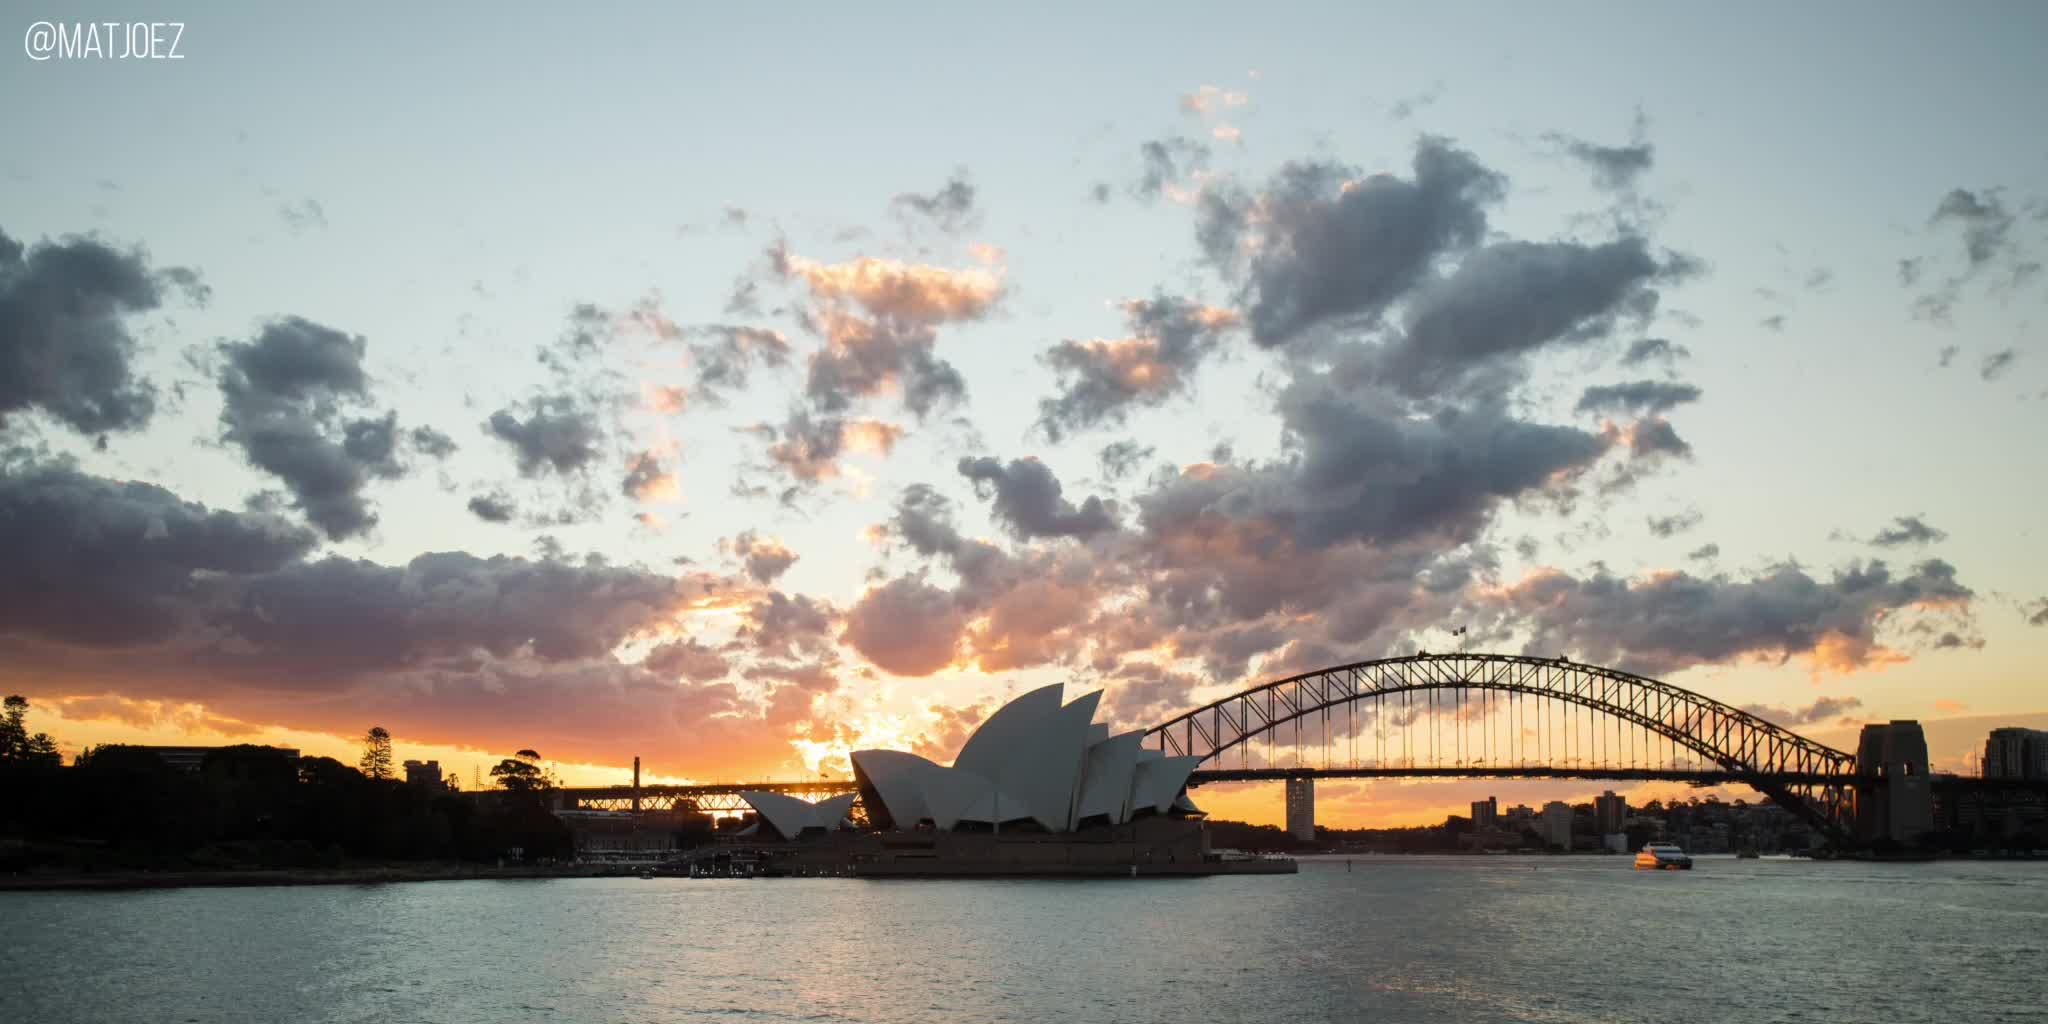 matjoez, timelapse, weathergif, Sydney Opera House at sunset GIFs